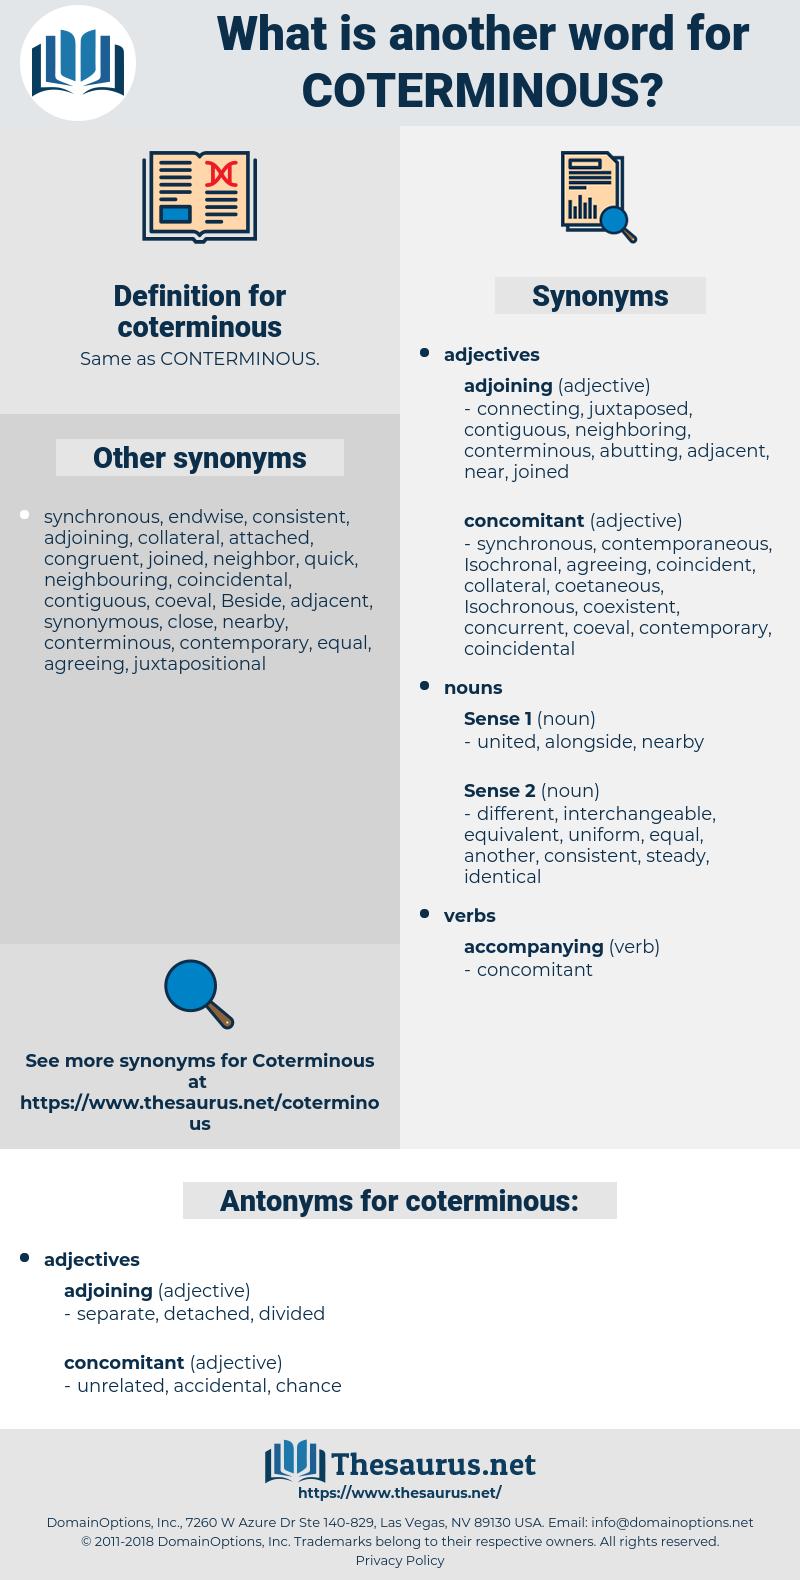 coterminous, synonym coterminous, another word for coterminous, words like coterminous, thesaurus coterminous